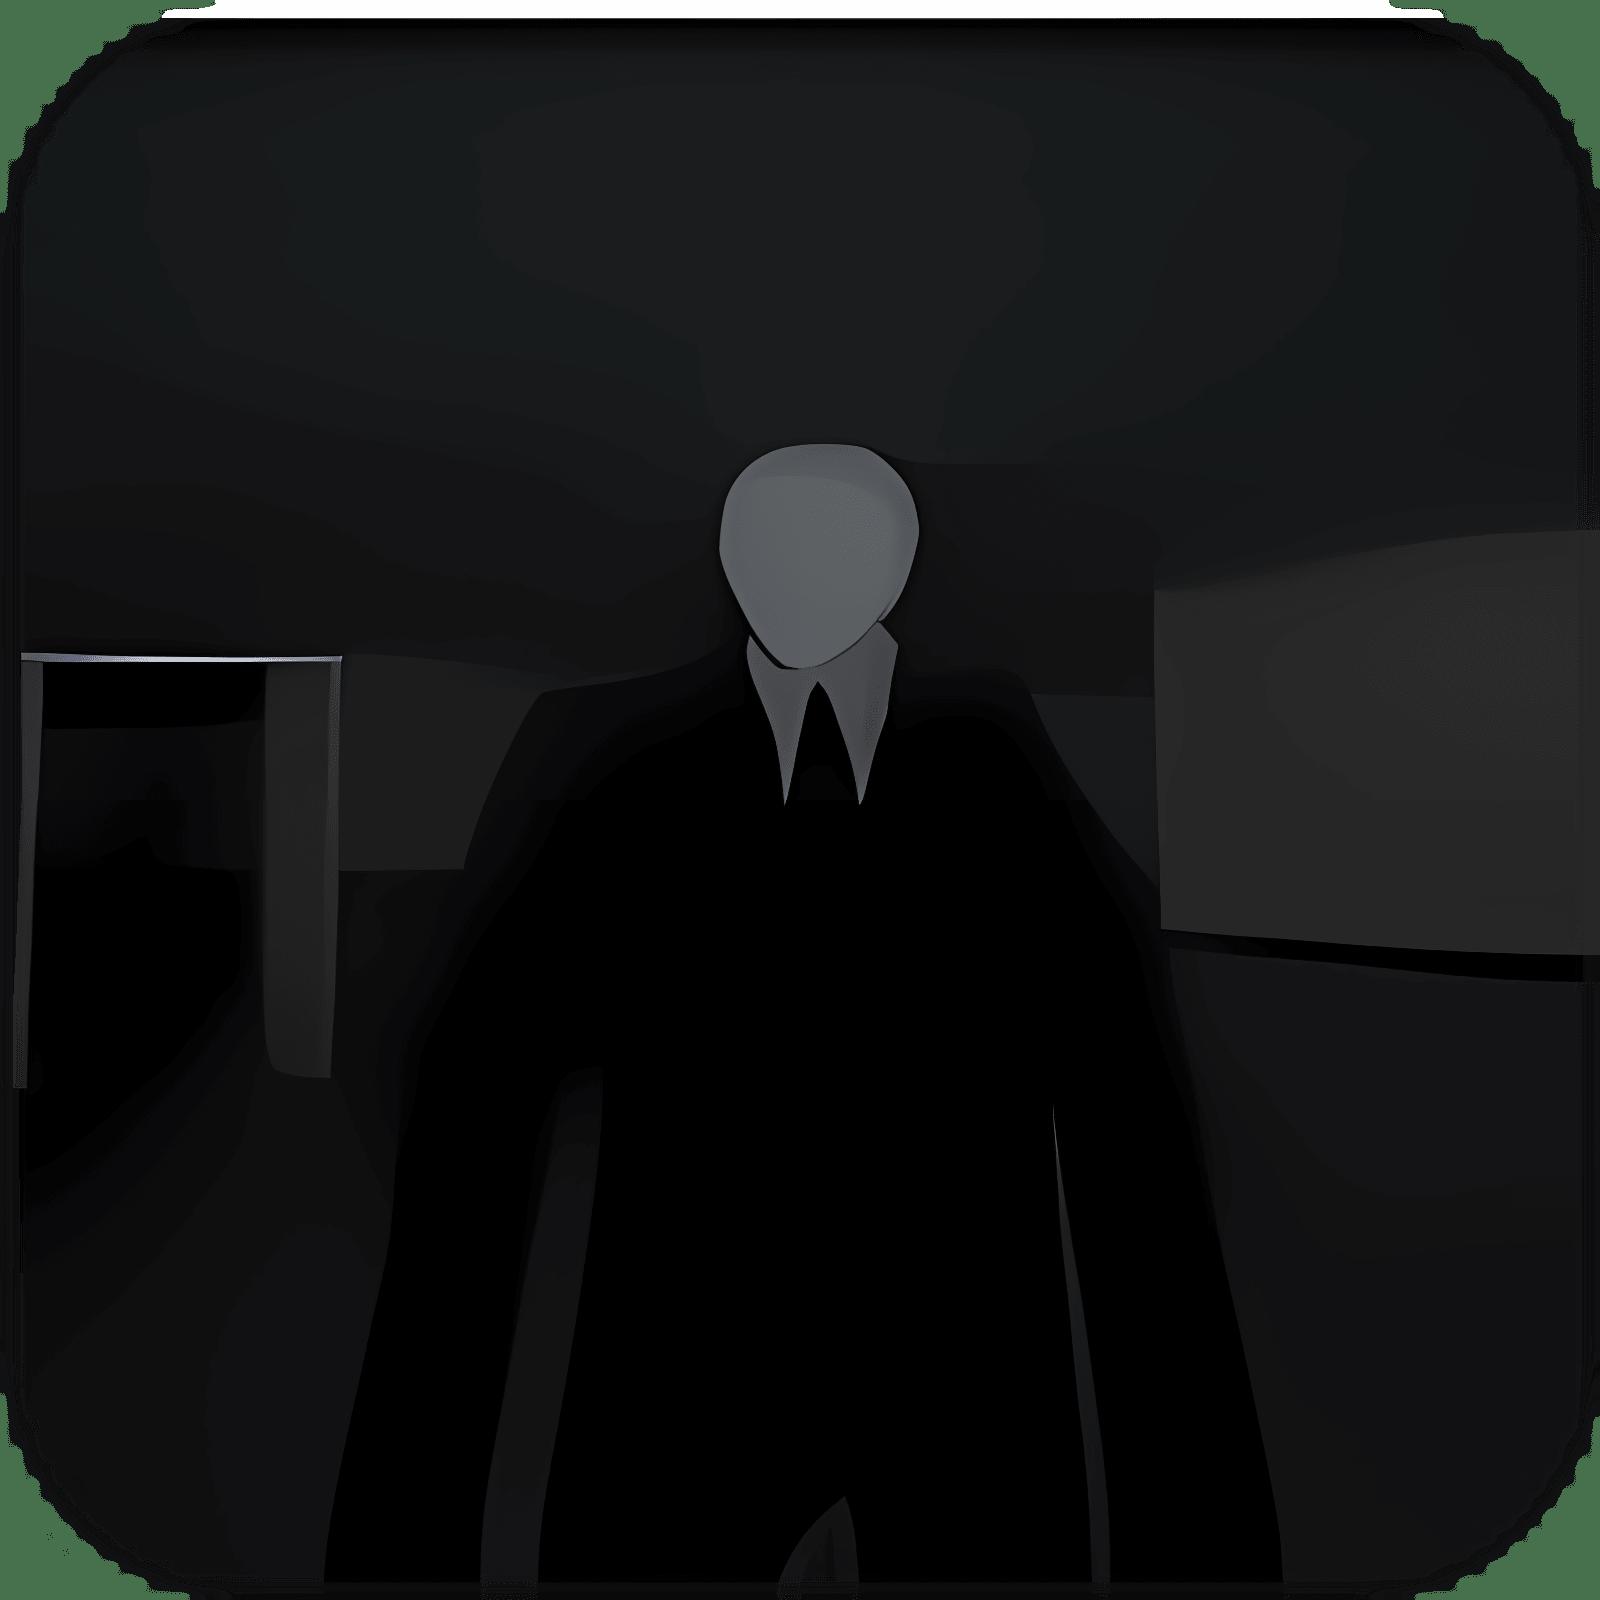 Slenderman's Shadow: Claustrophobia